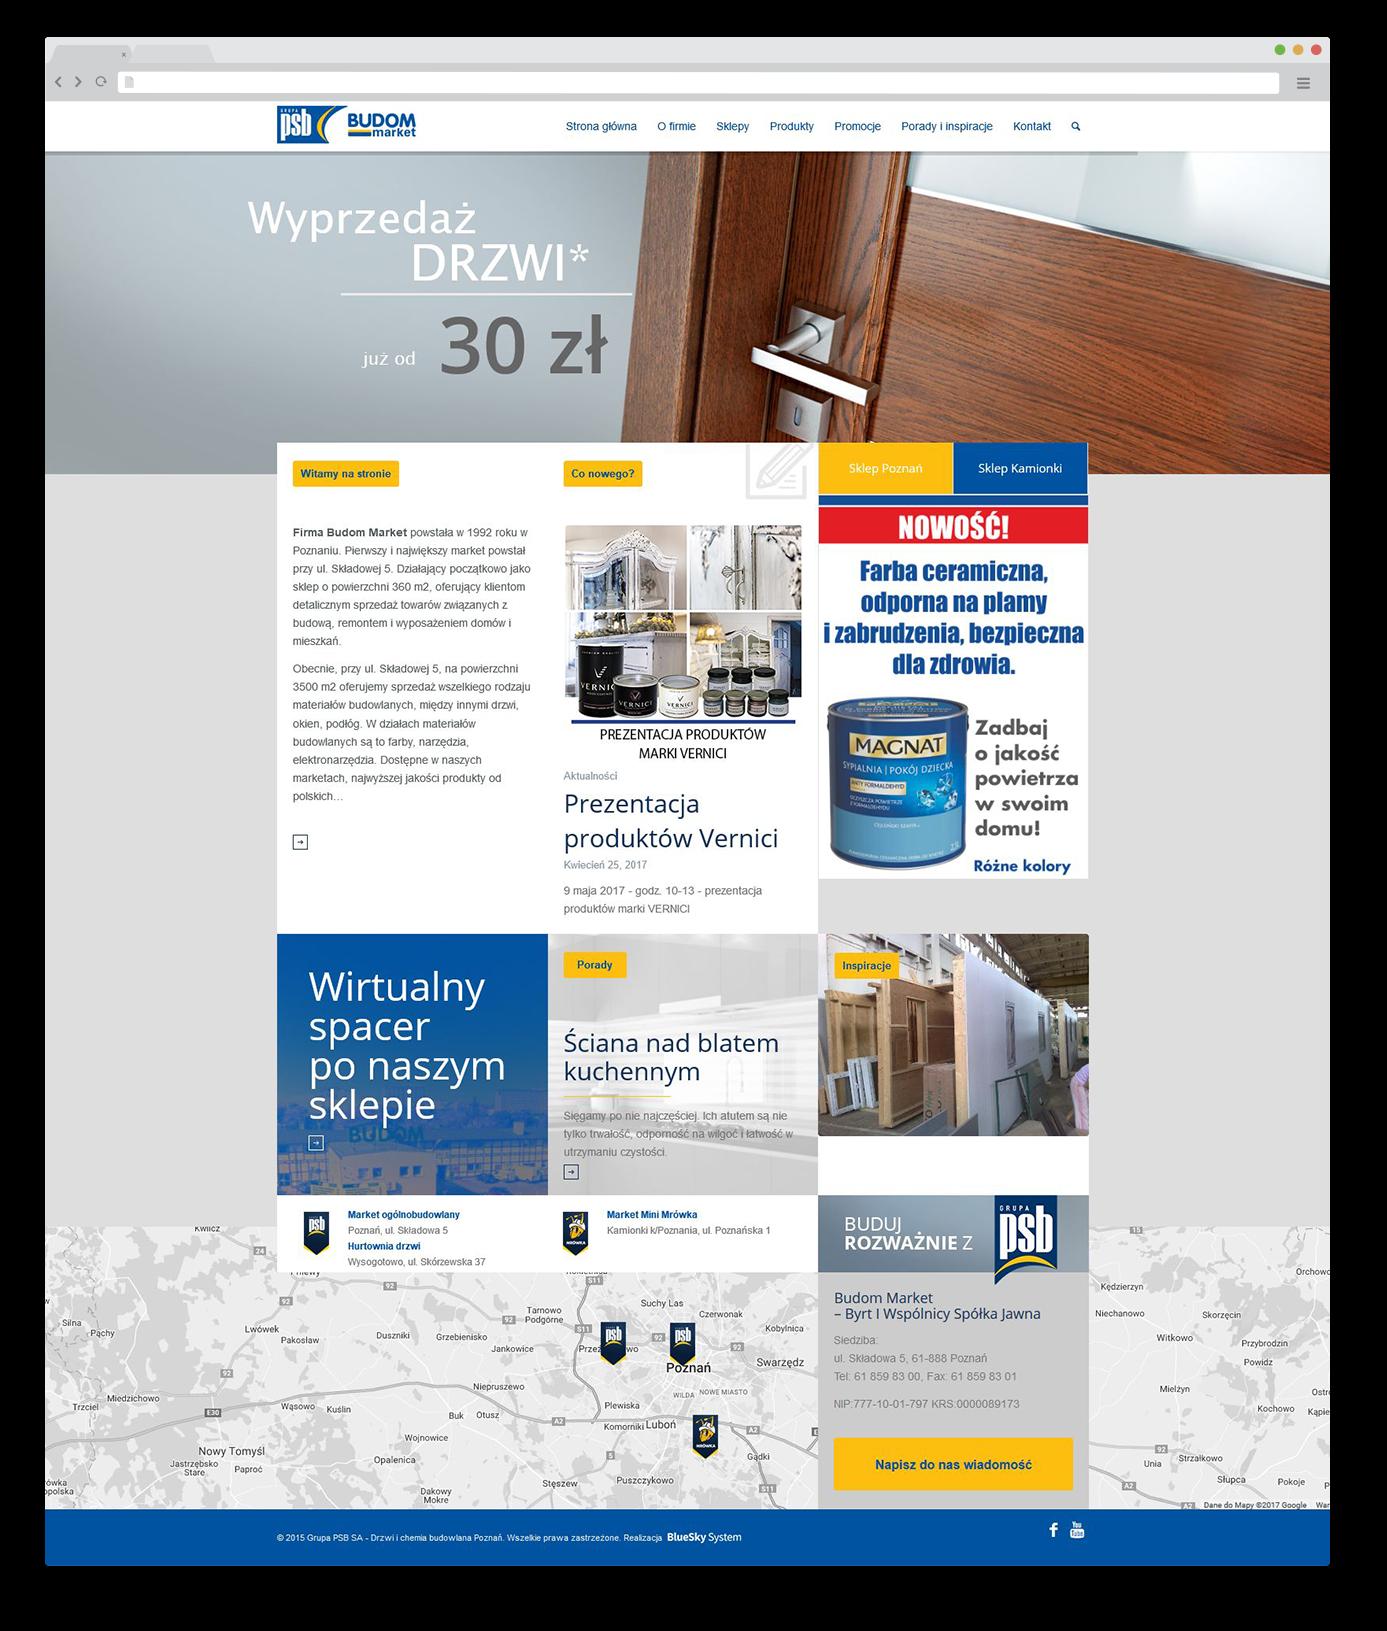 Portfolio BlueSky System Grupa PSB S.A. - FULL